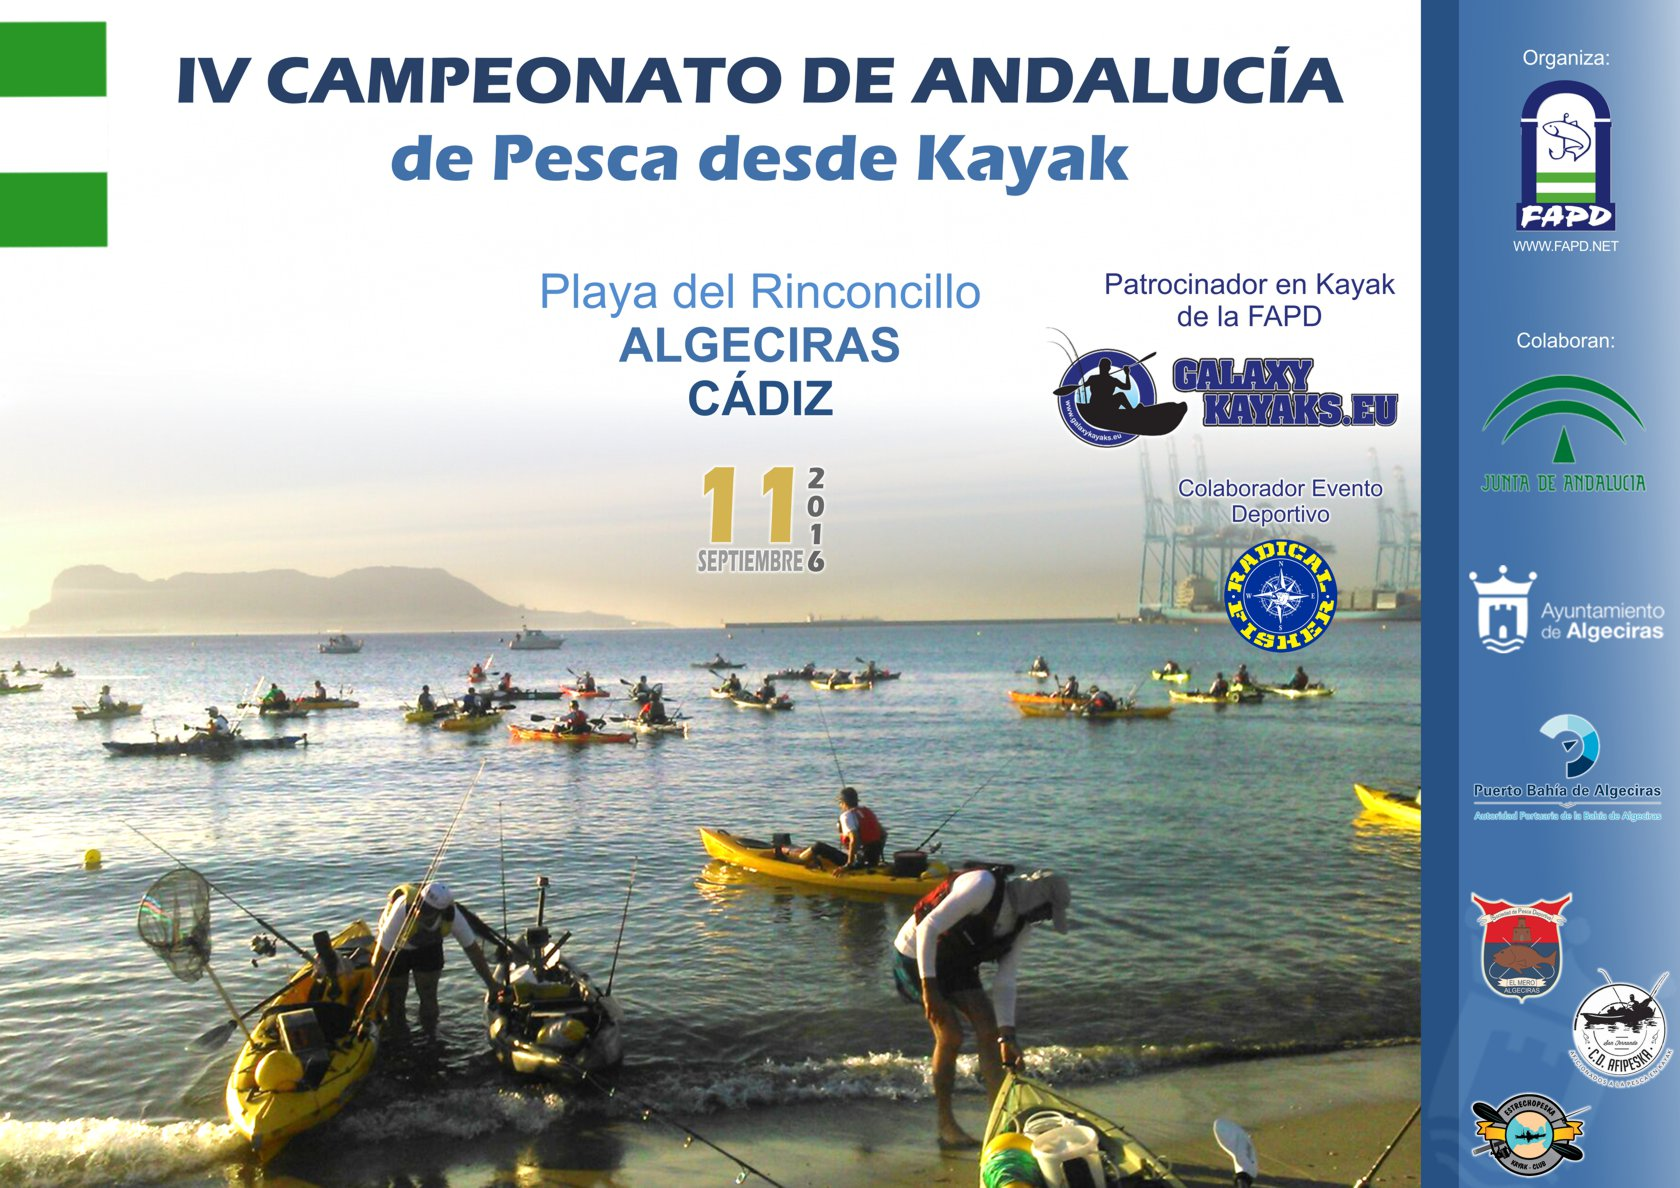 Campeonato Andalucia Kayak  11_09_2016 final web